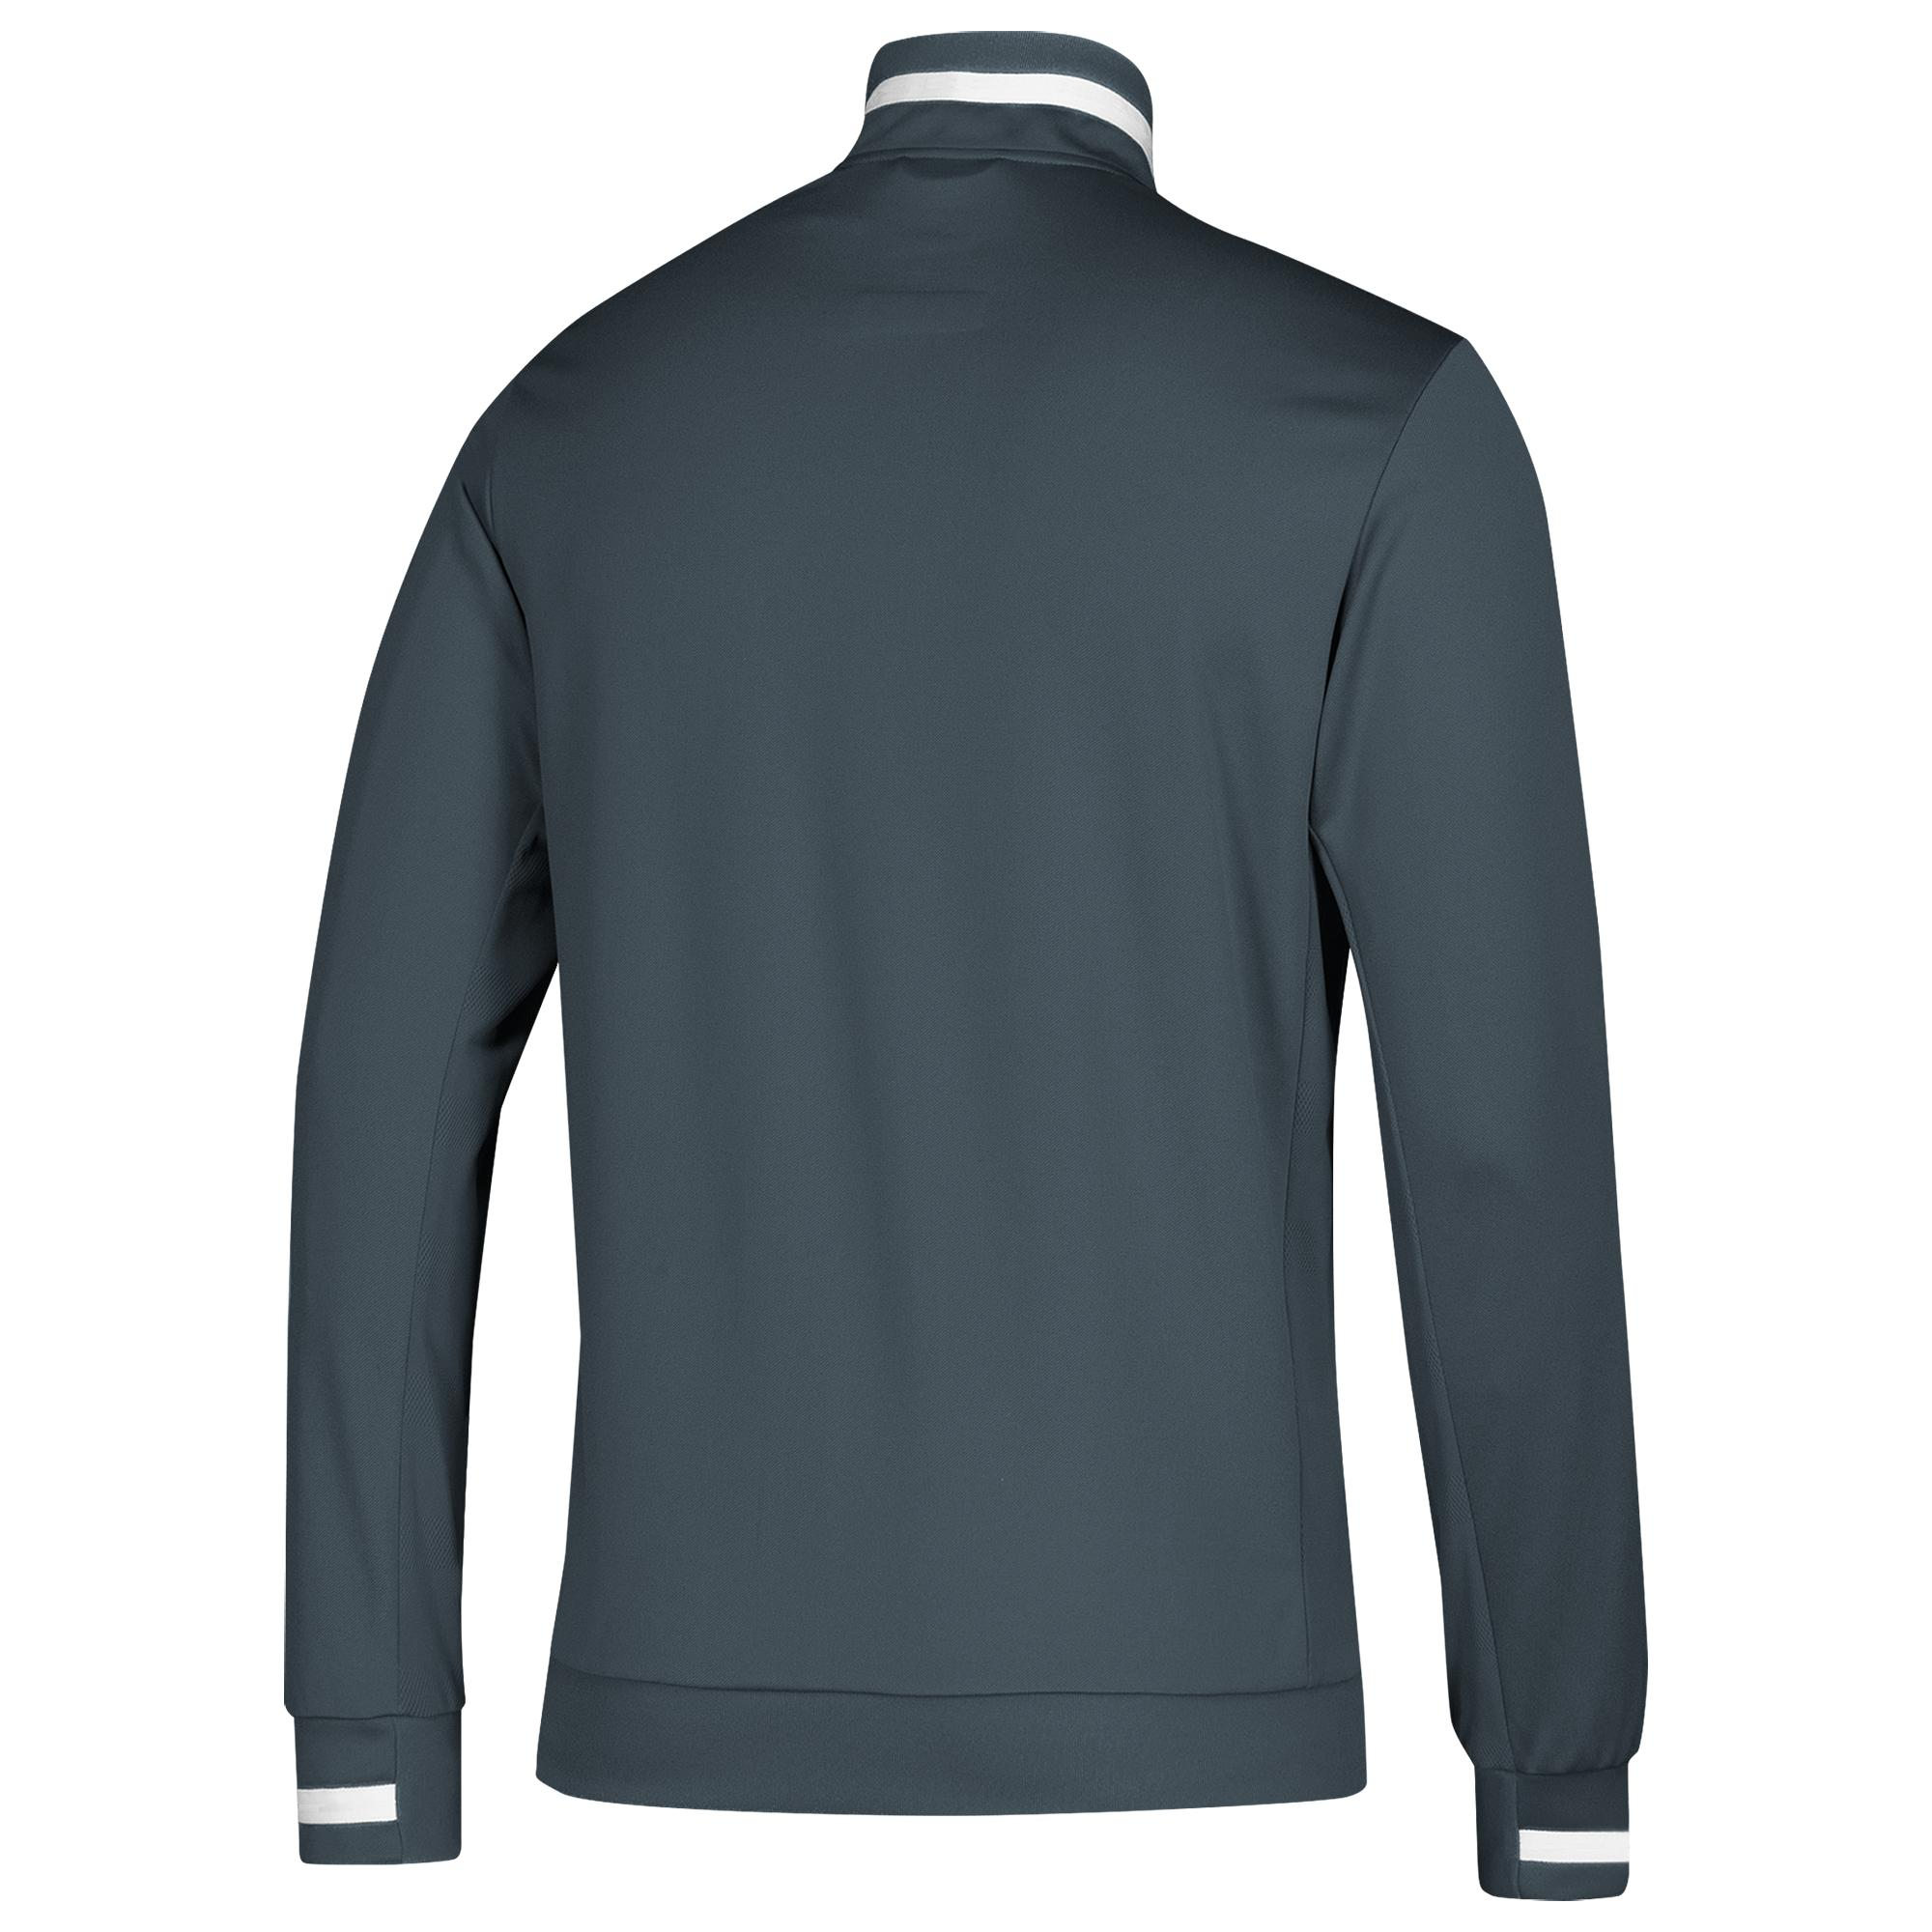 Classic Olive US Polo Association Boys Toddler Stadium Parka Outerwear Jacket 2T